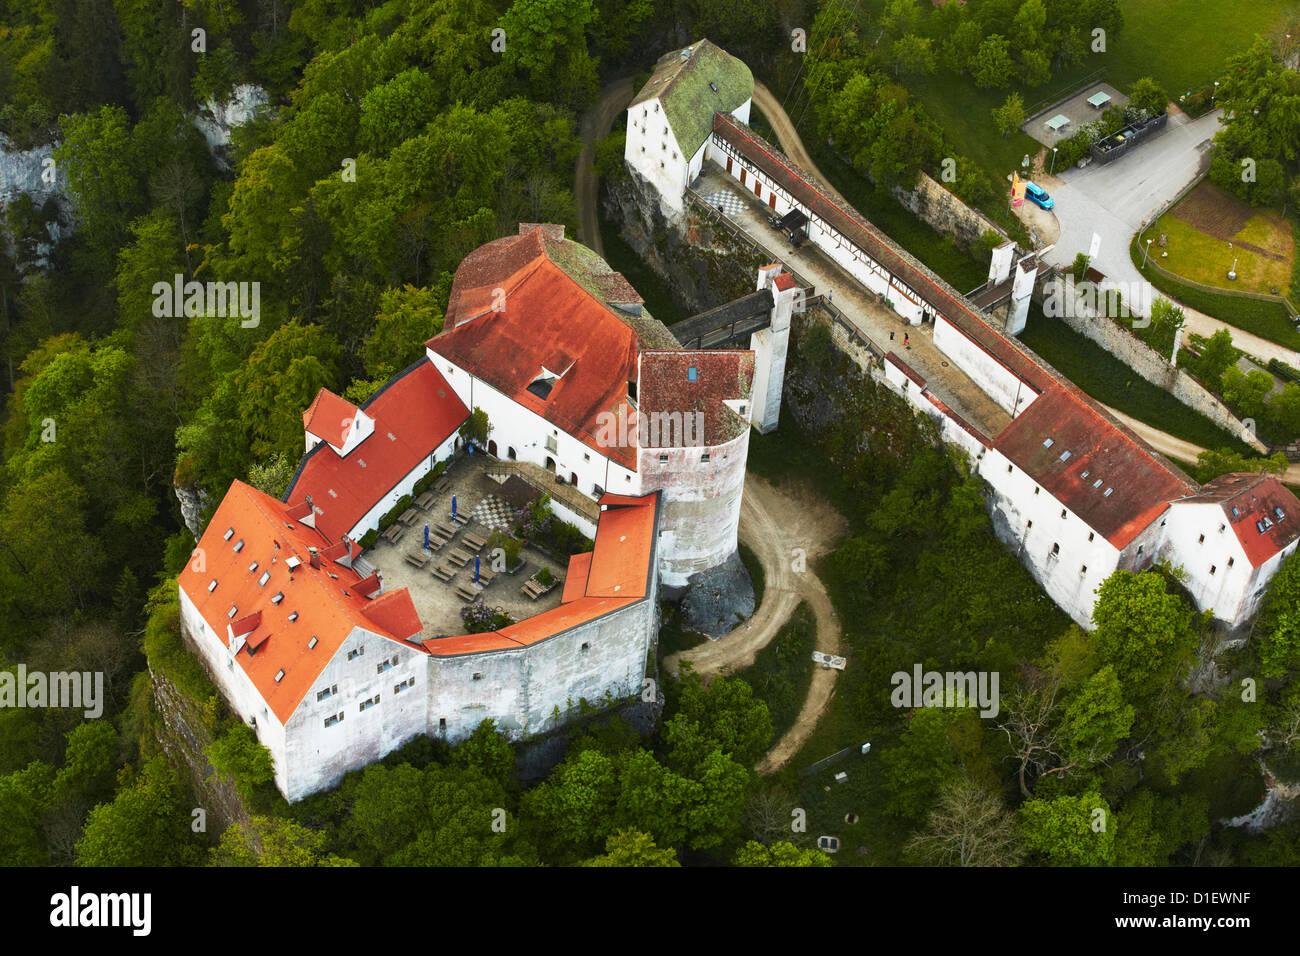 Castillo de Wildenstein, Sigmaringen, Alemania, foto aérea Imagen De Stock